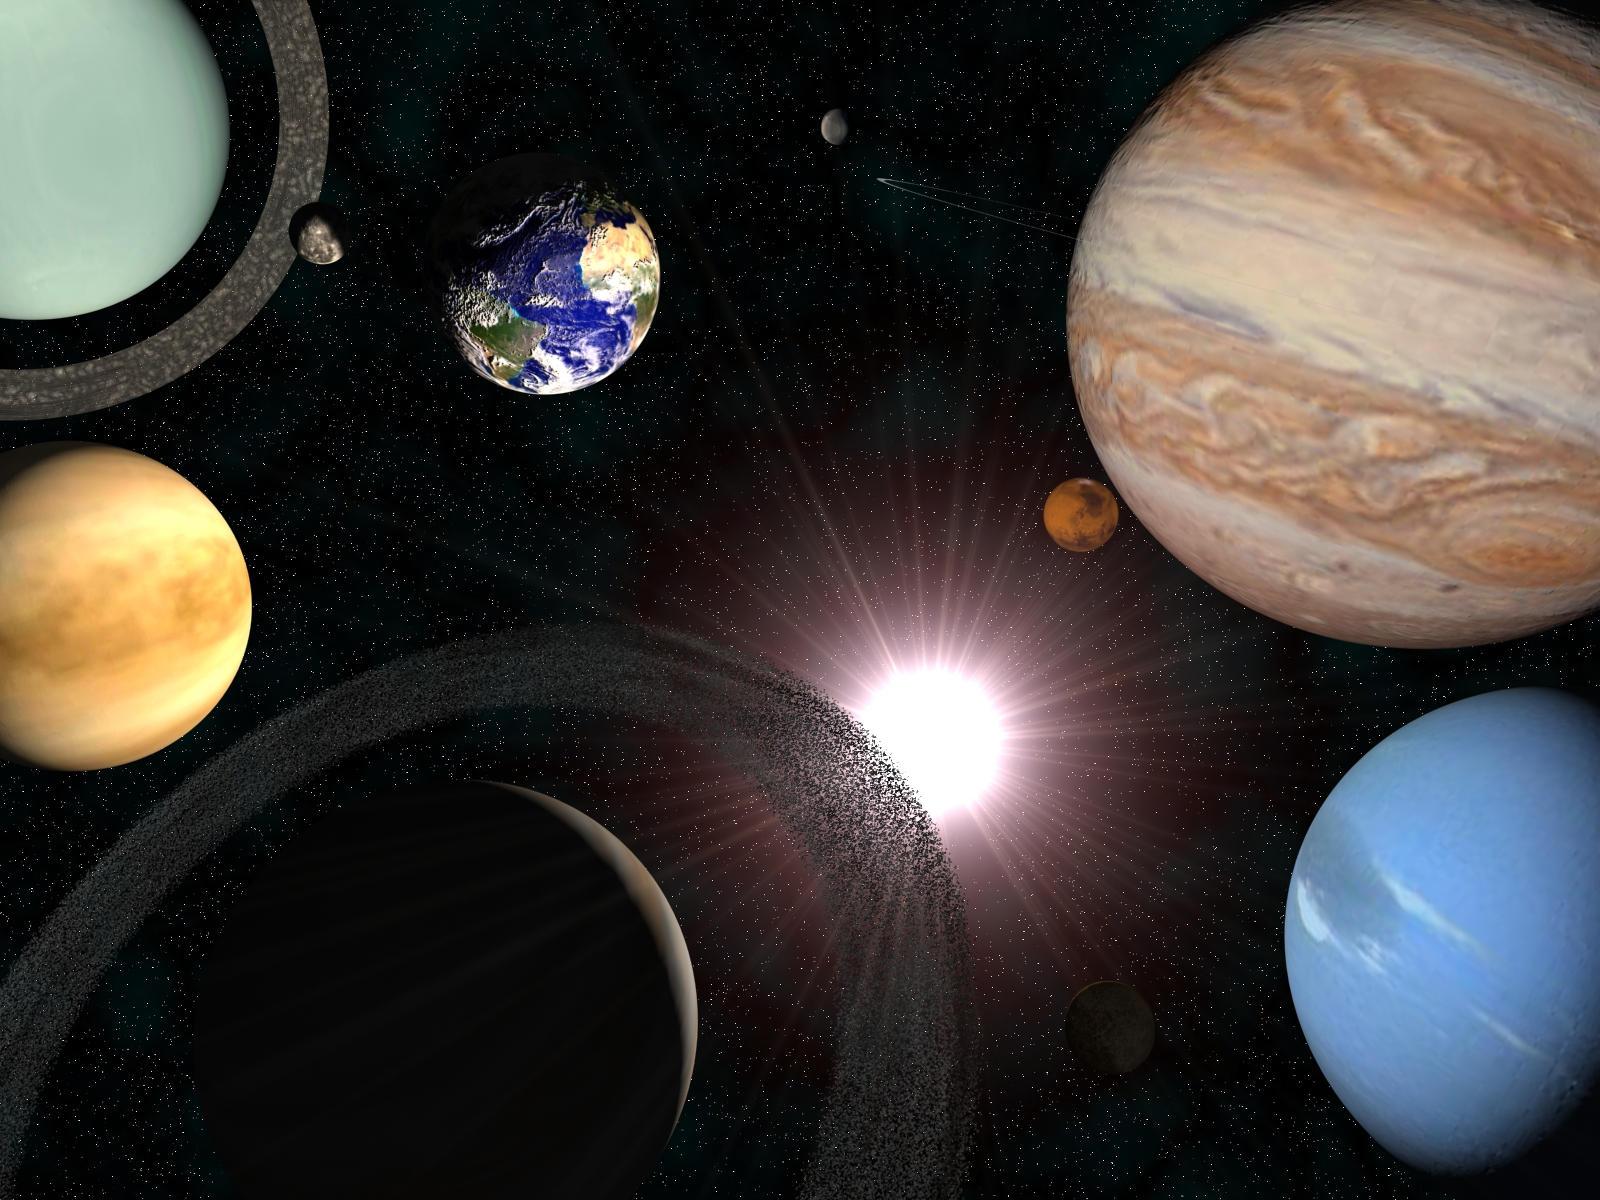 фото для планета